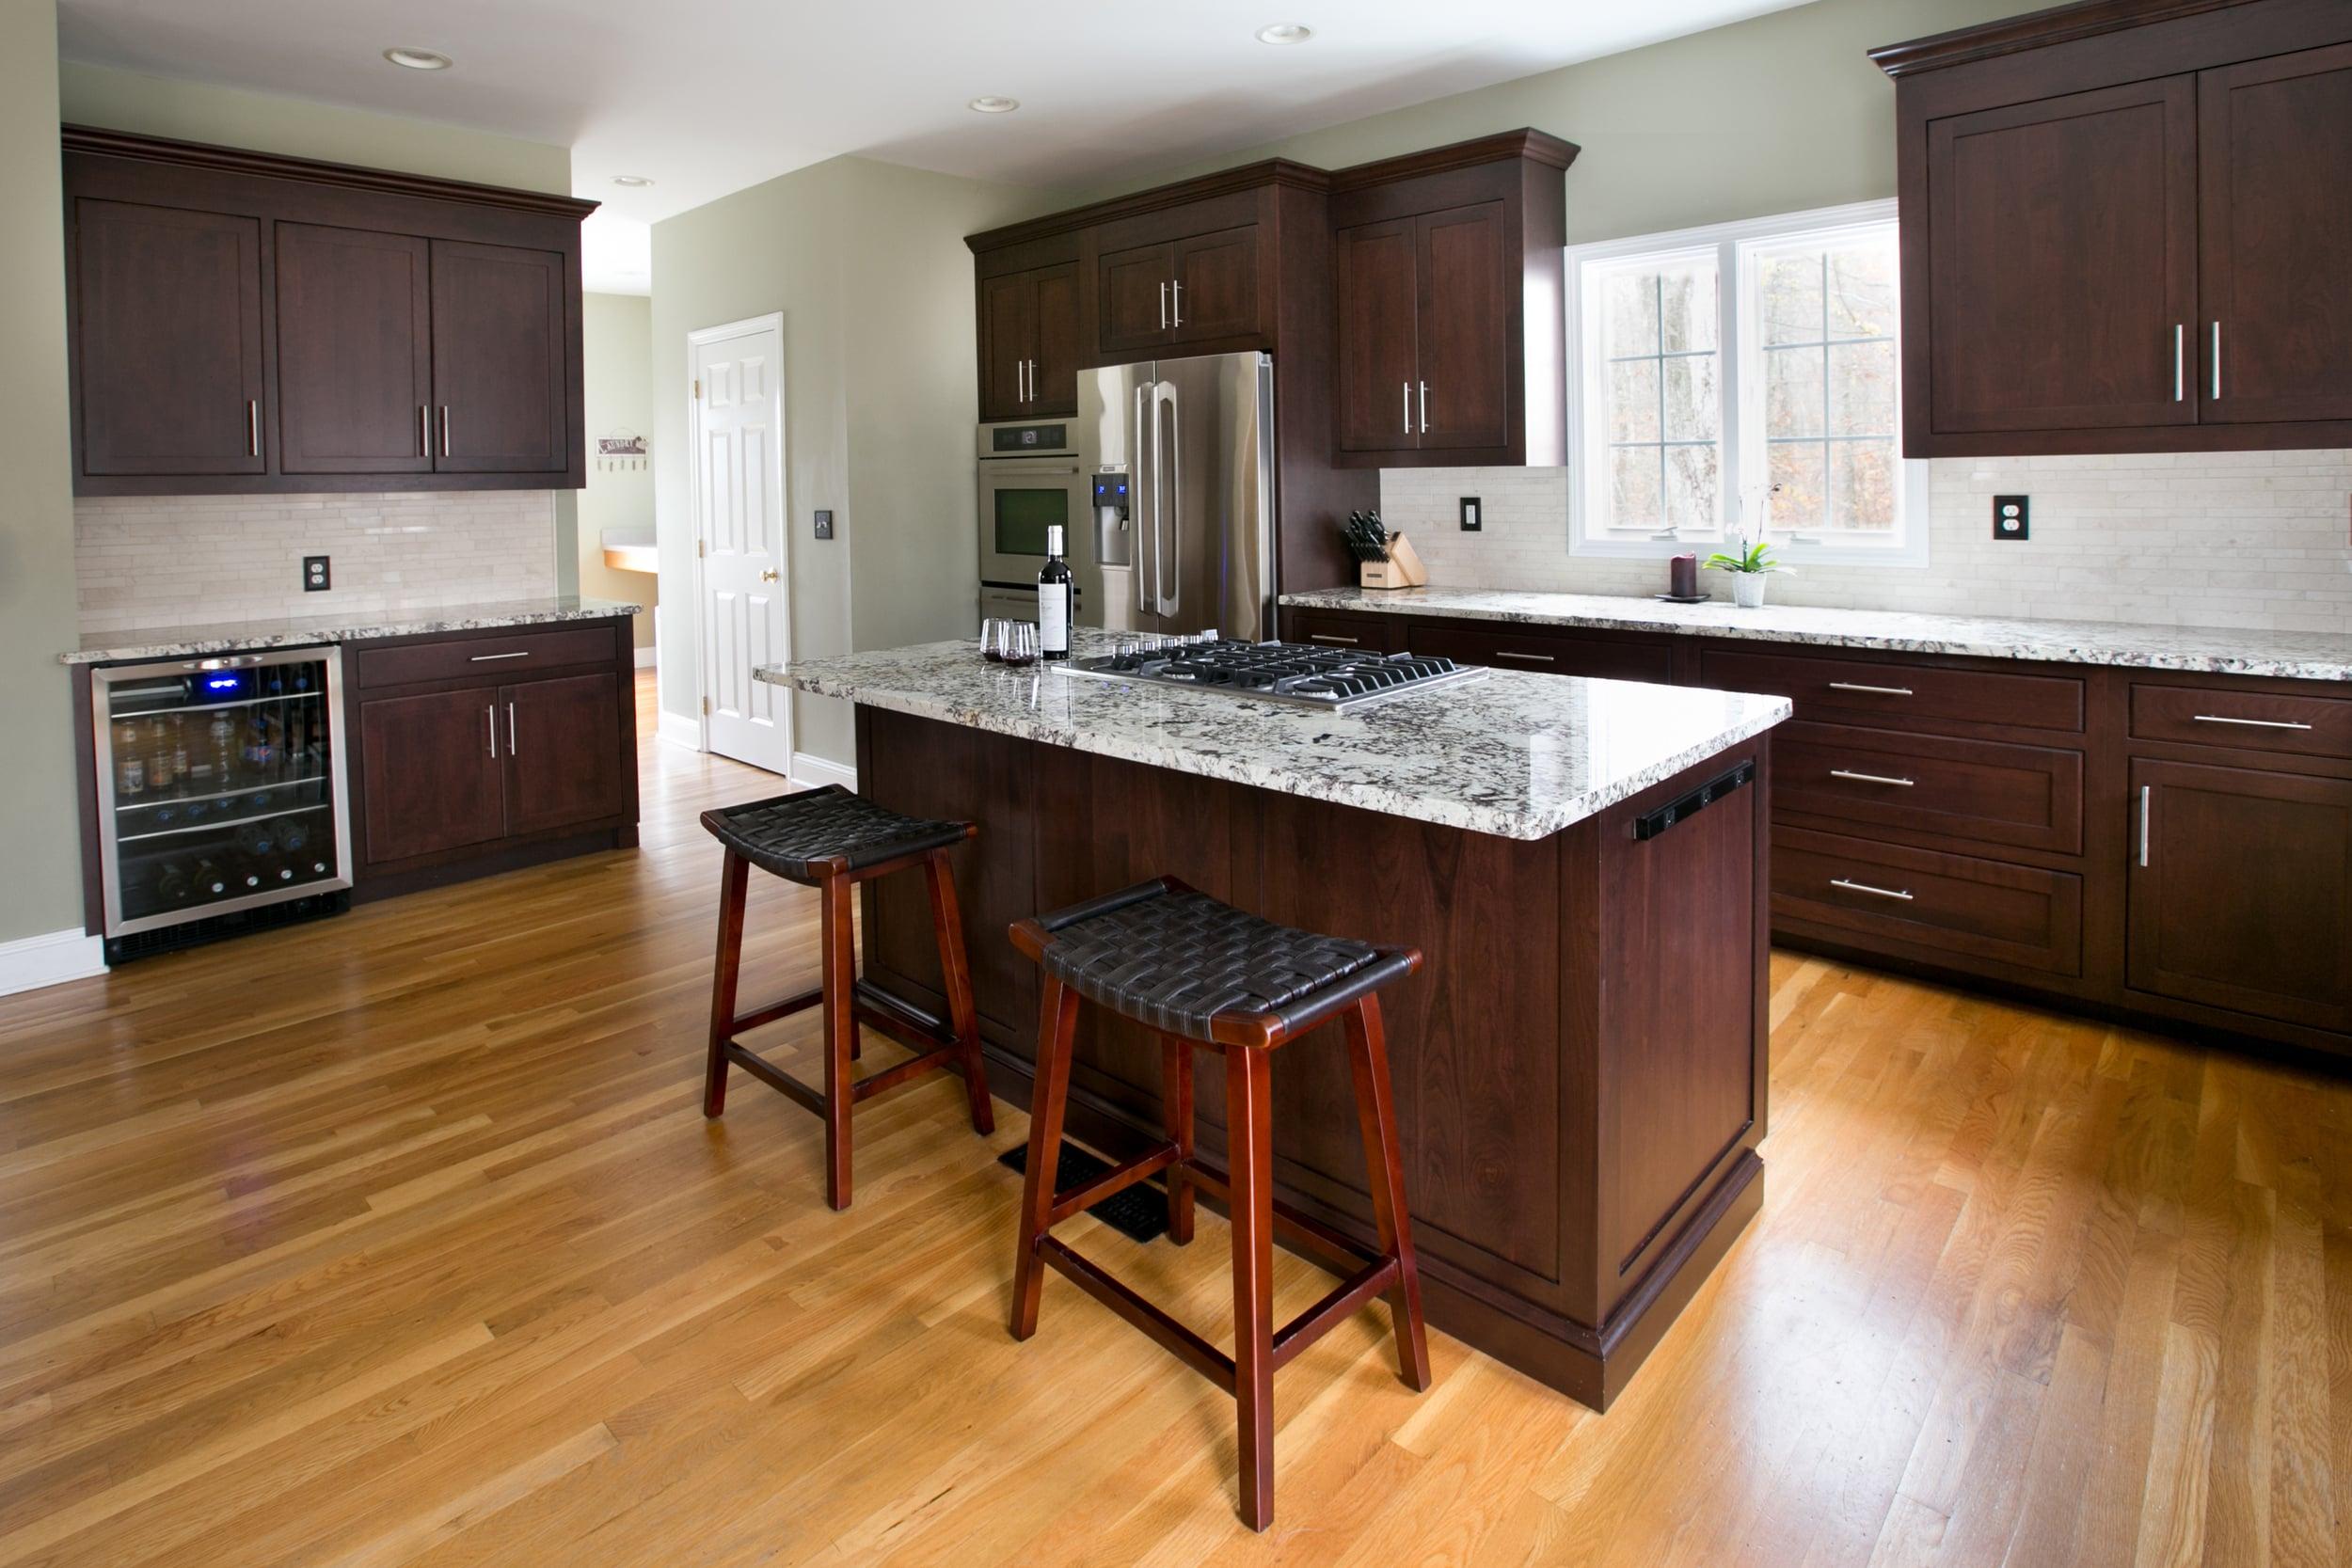 ackleycabinet cabinets kitchen custom cabinets kitchen design kitchen remodeling ct